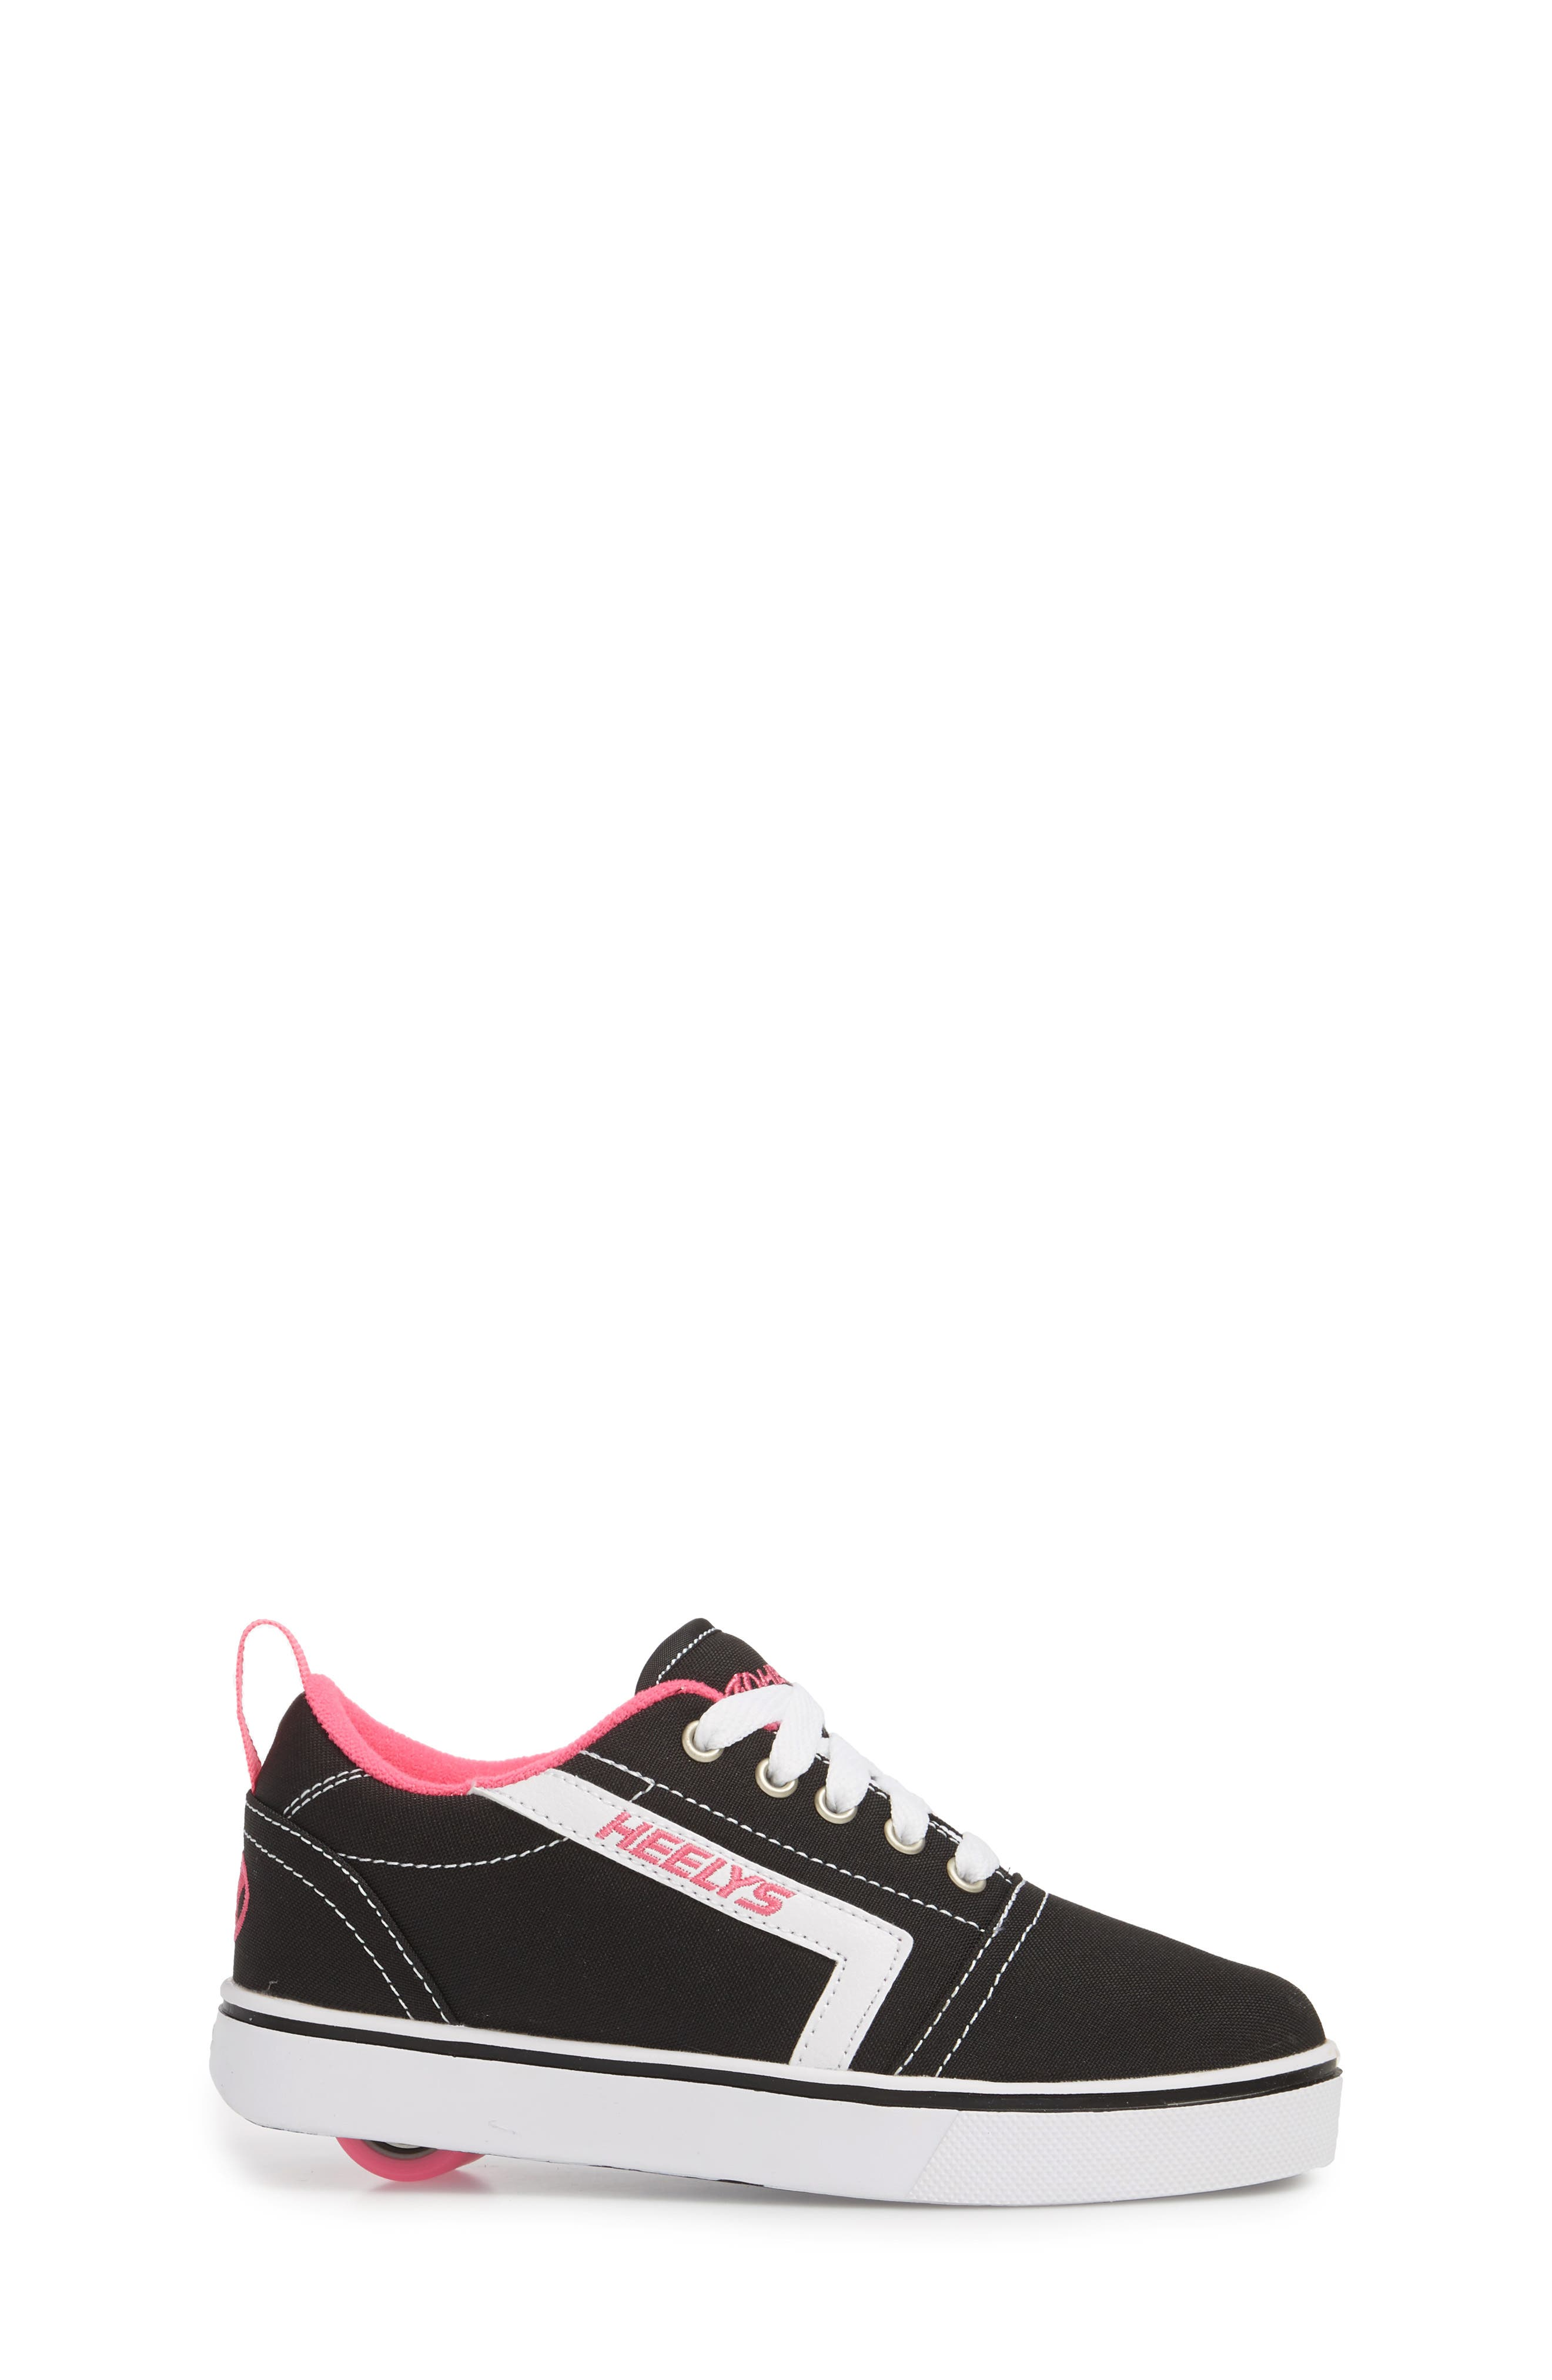 GR8 Pro Wheeled Sneaker,                             Alternate thumbnail 3, color,                             Black/ White/ Hot Pink